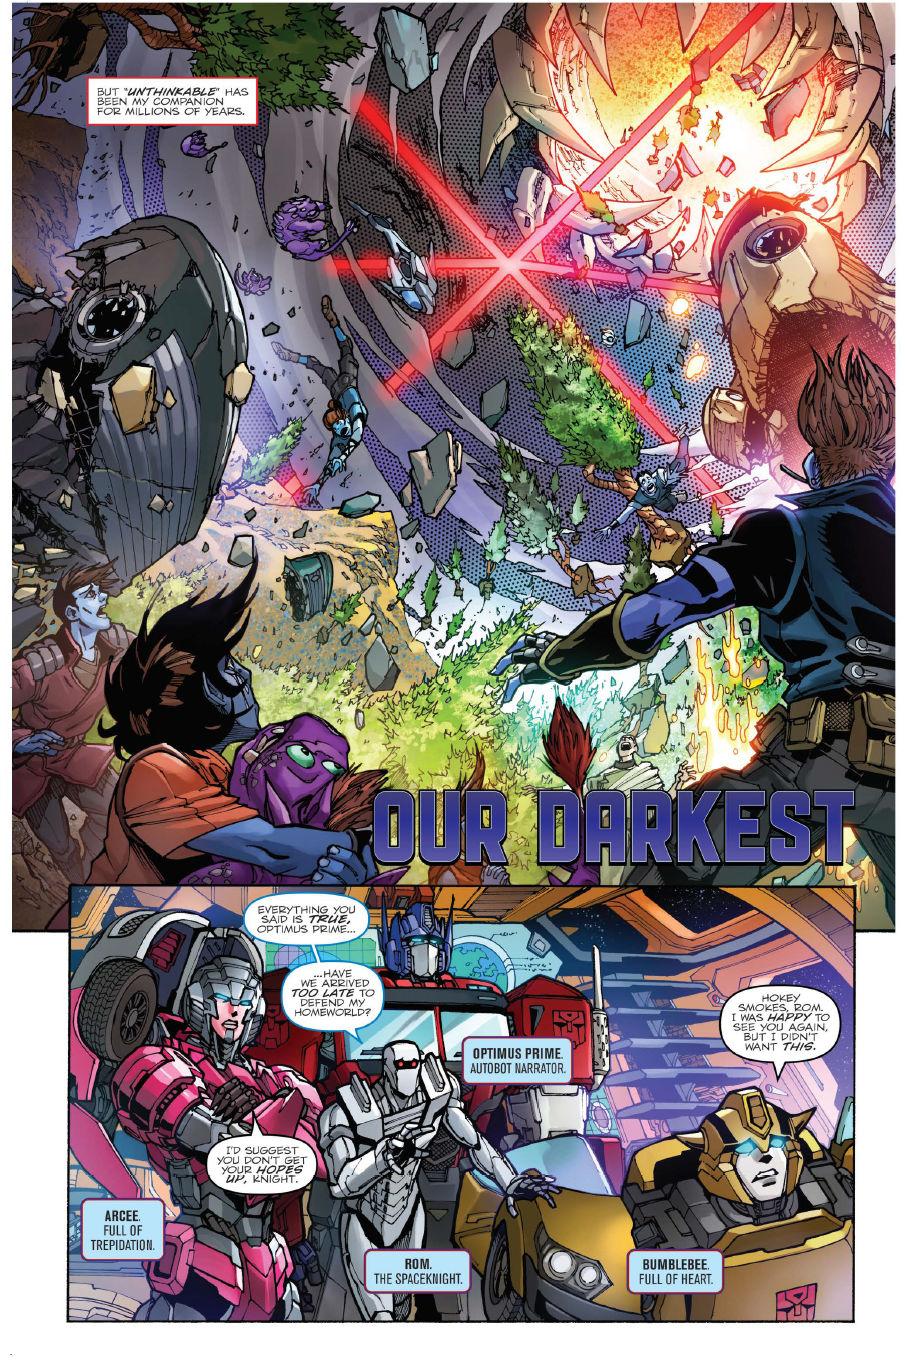 FCBD 2018 Transformers: Unicron #0 - Preview 2.